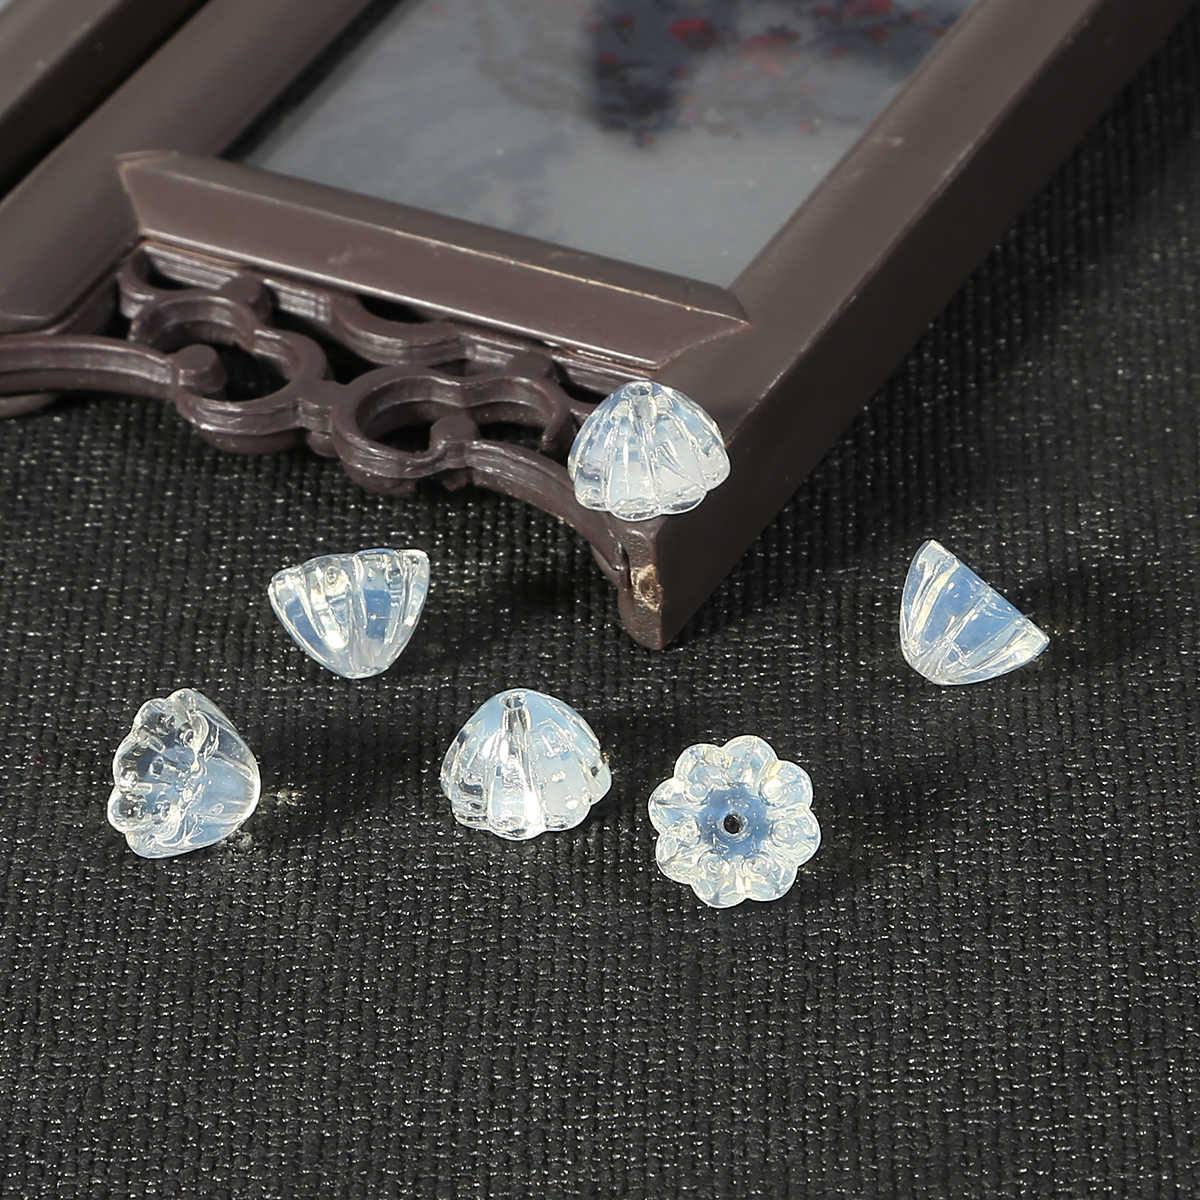 Baru Imitasi Giok Hijau Putih Manik-manik Lotus Pesona Retro Perhiasan Aksesoris untuk Drop Anting-Anting Kalung Liontin Gaya Cina